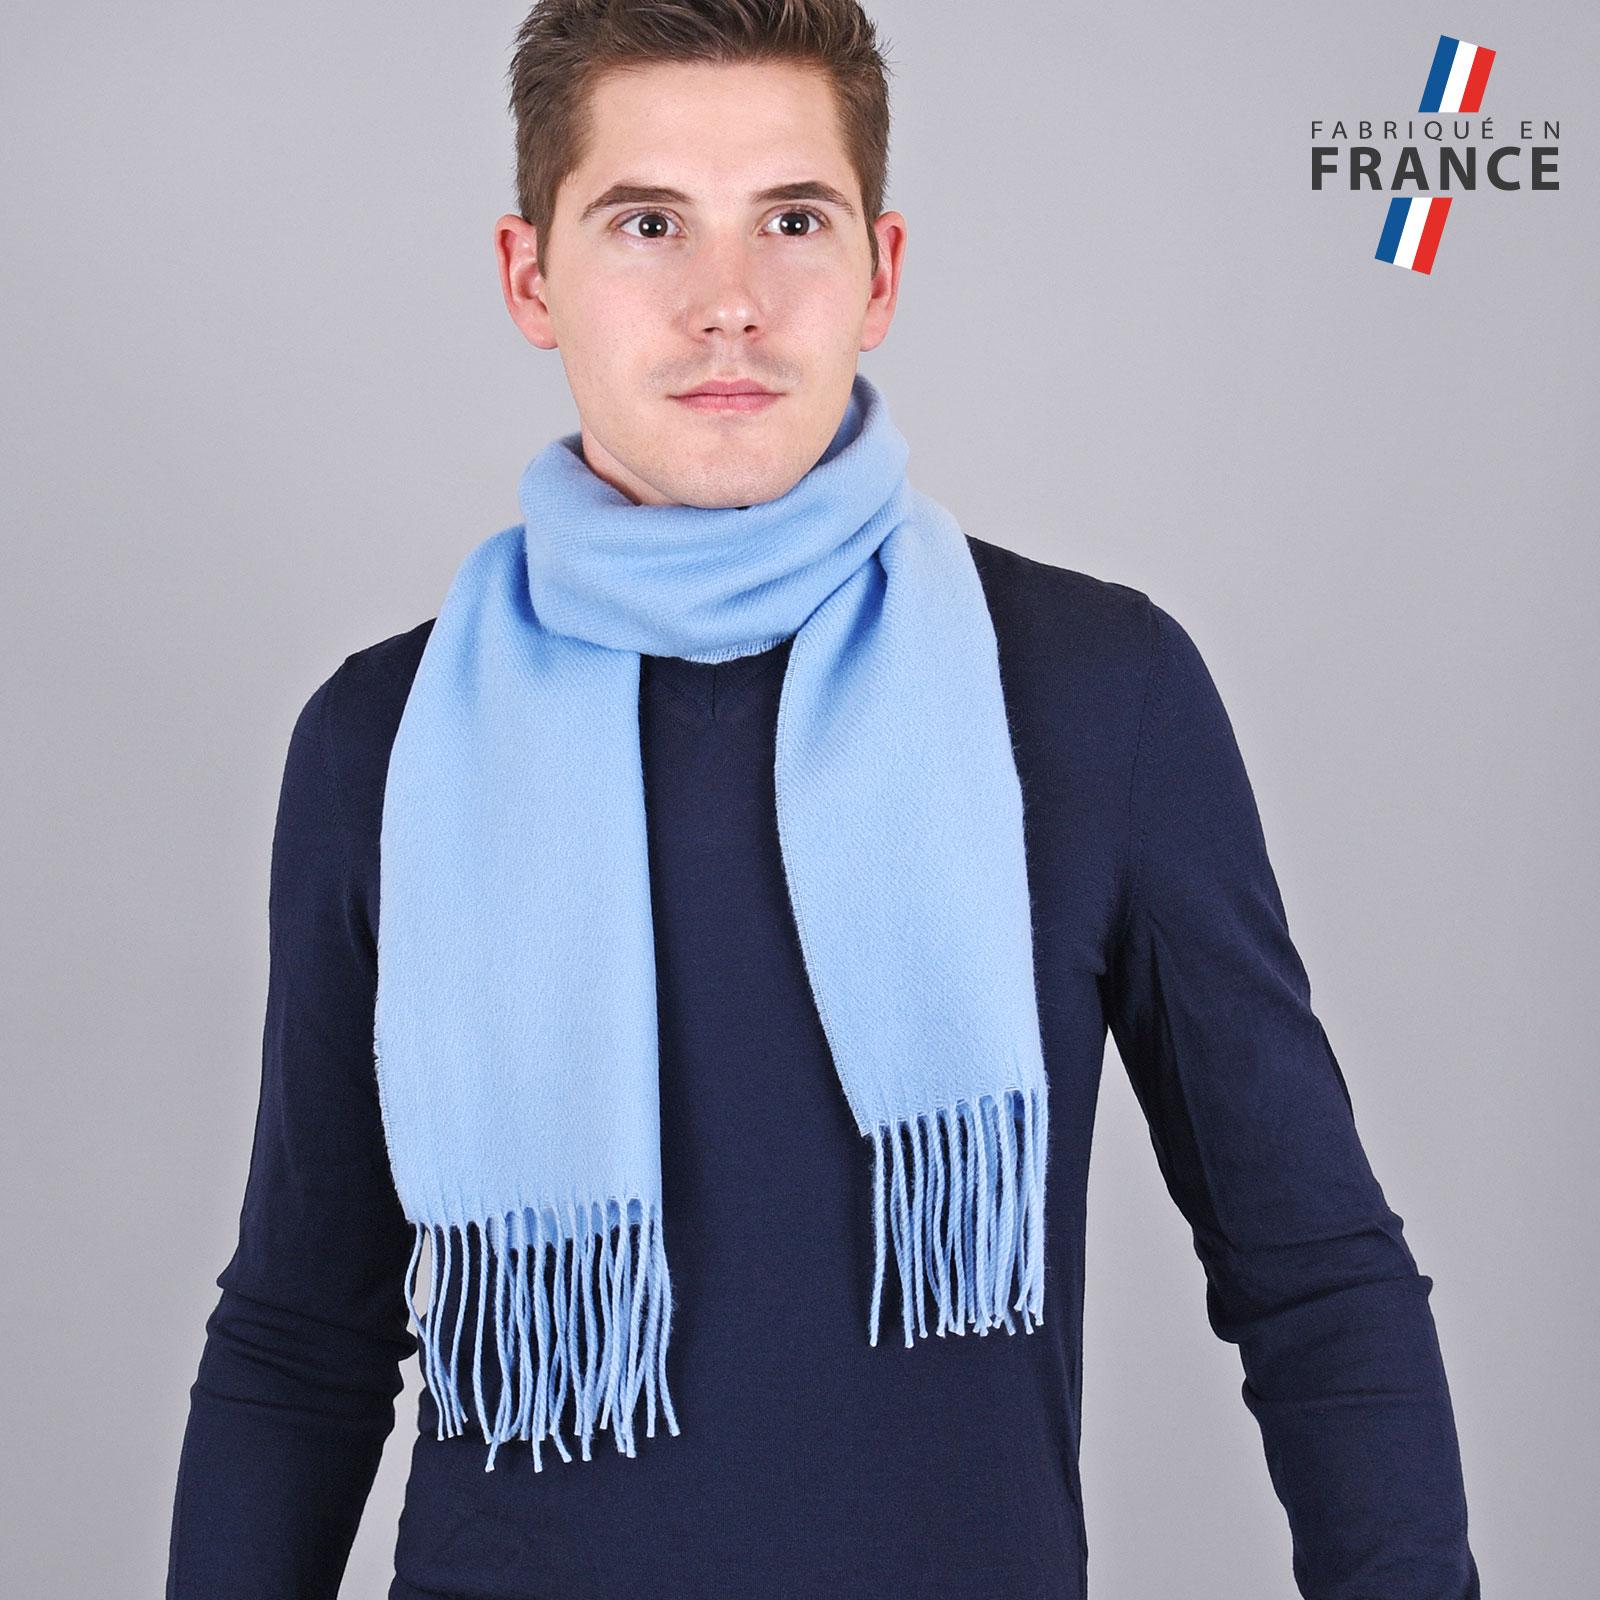 Echarpe franges bleu ciel - Fabriqué en France 148f8f17b88